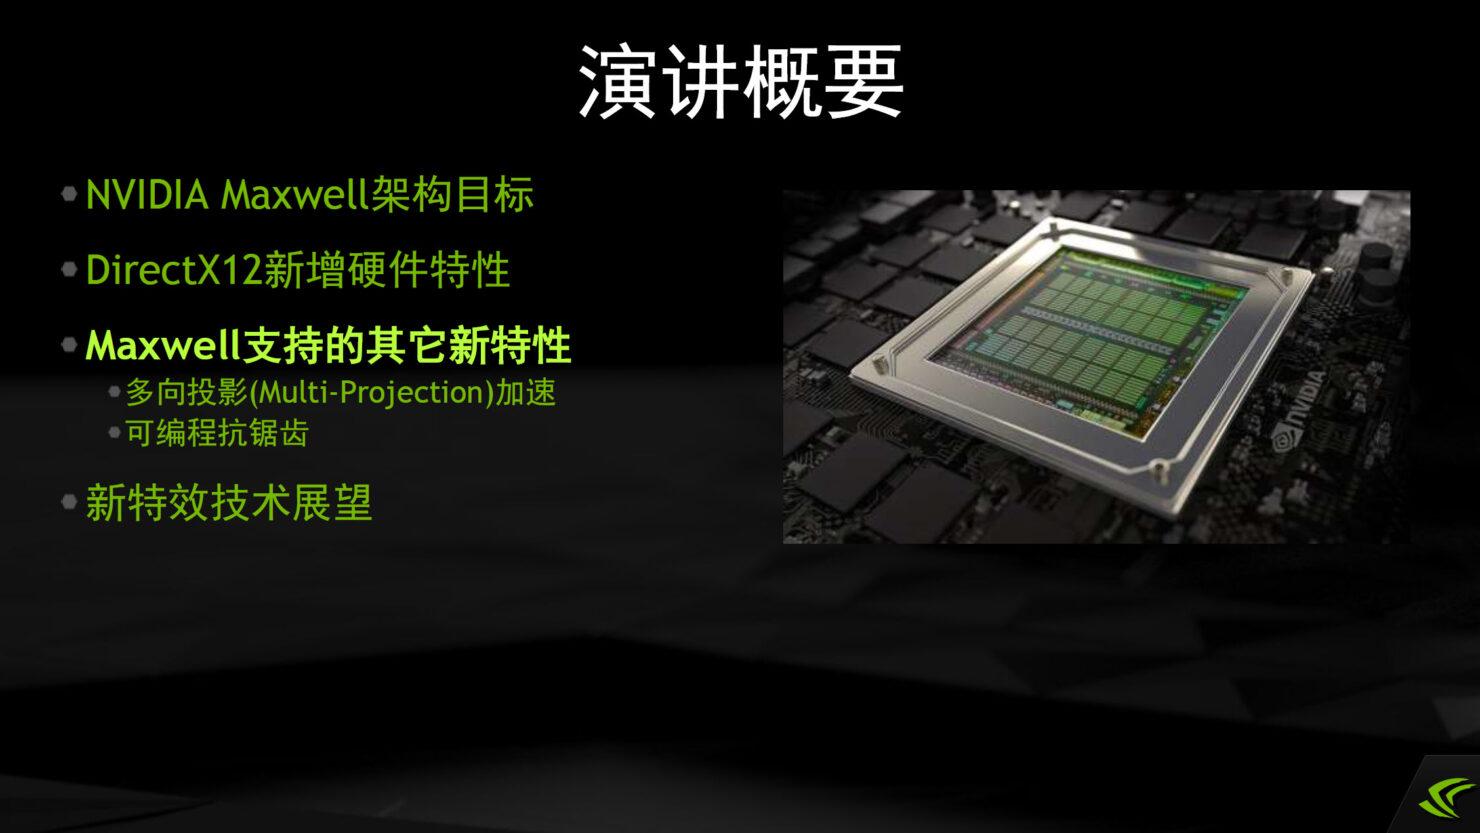 nvidia-directx-12_maxwell-multi-projection